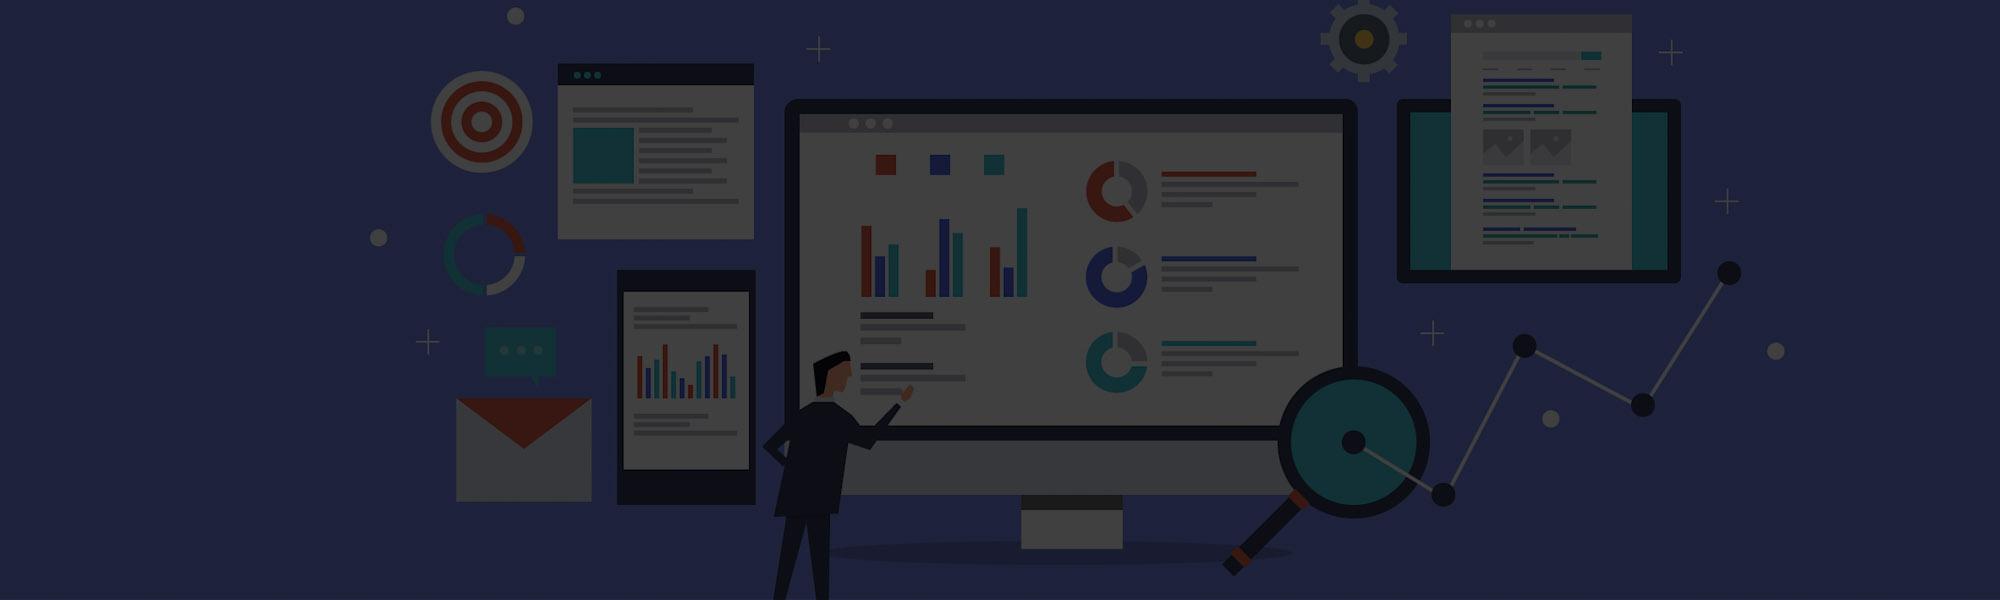 SEO and Social Media: 50 Expert Tips on Marketing Strategies